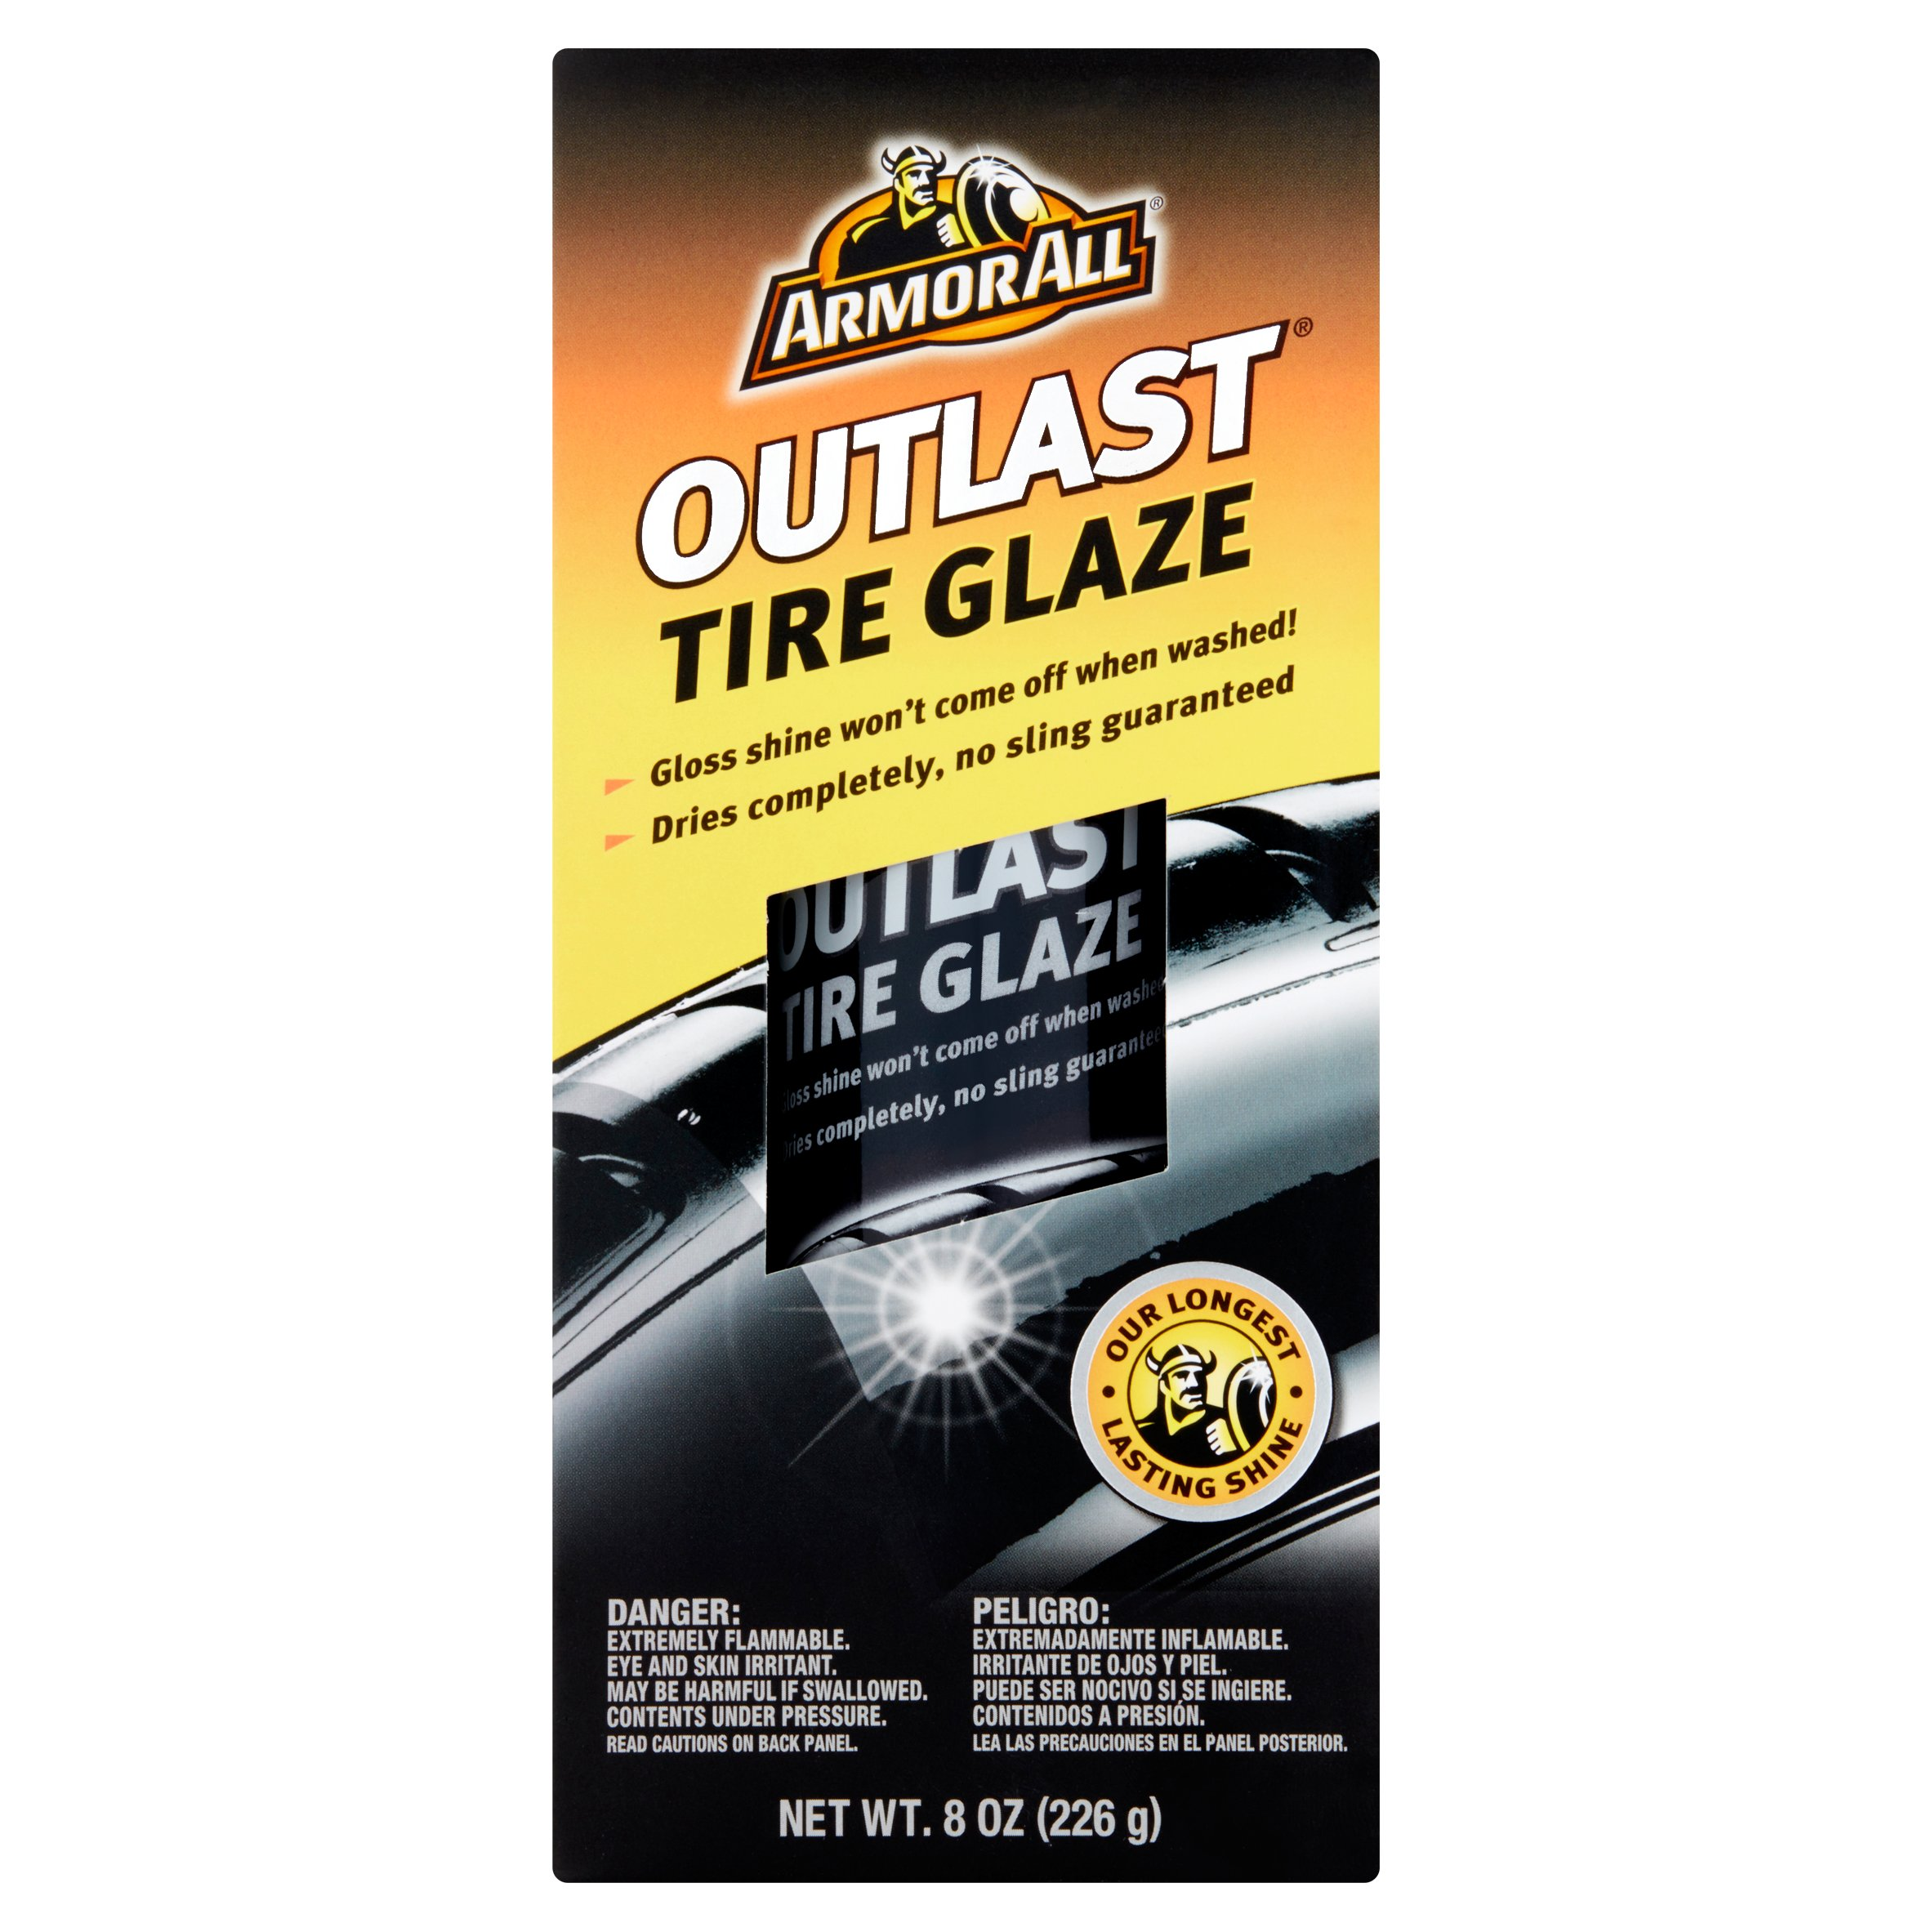 Armor All Outlast Tire Glaze, 8 ounces, Tire Shine, Auto Tire Care ...